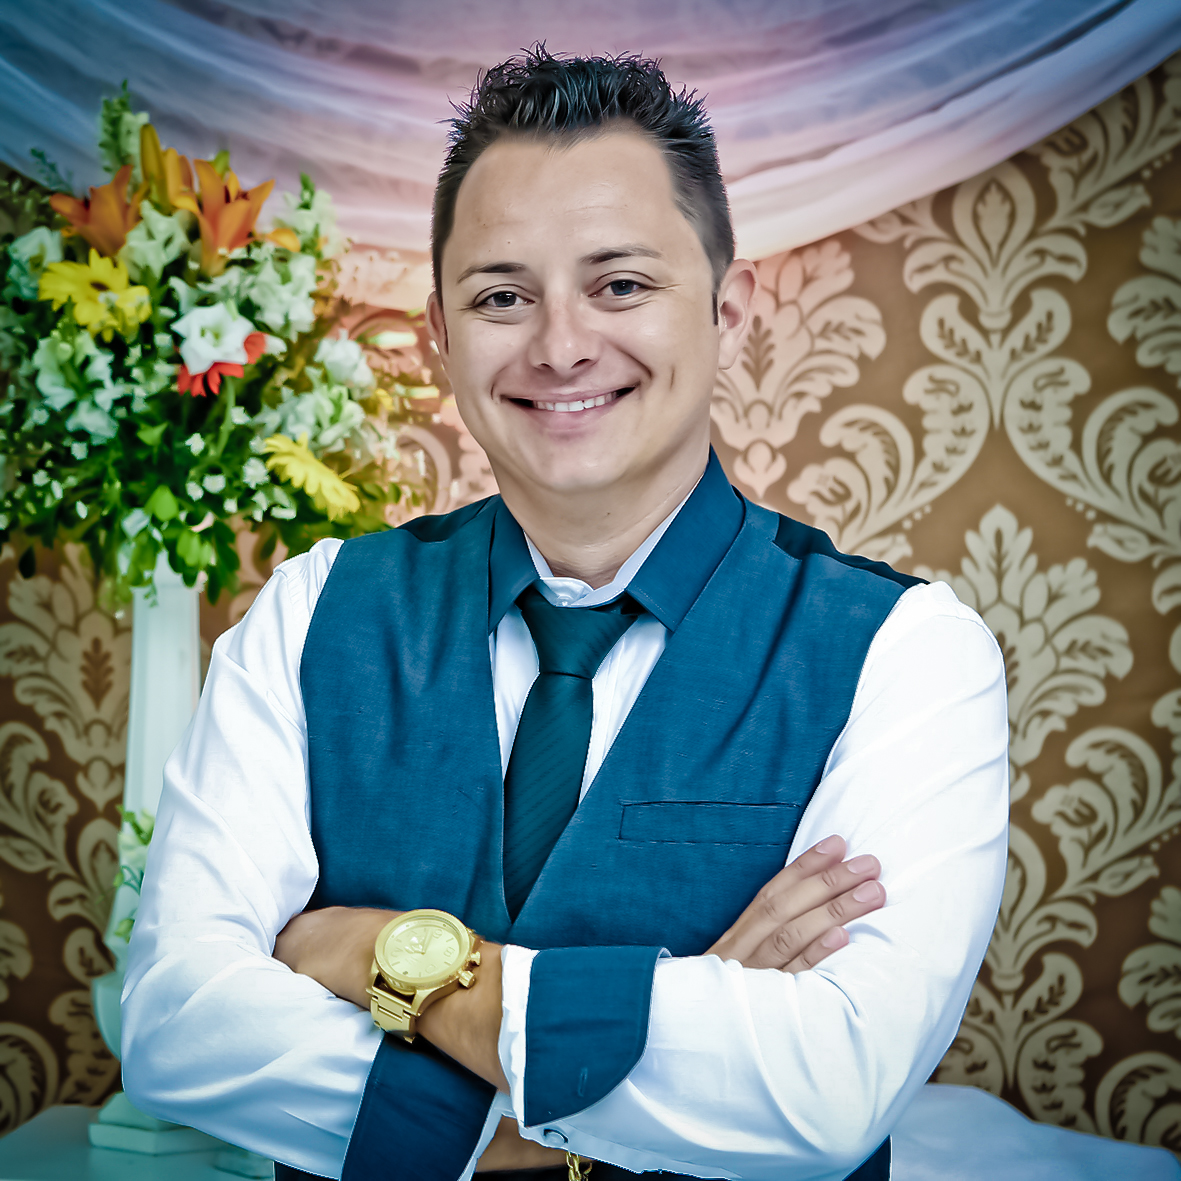 Contate Rafael Costa Fotografo casamentos 15 anos Venancio Aires RS